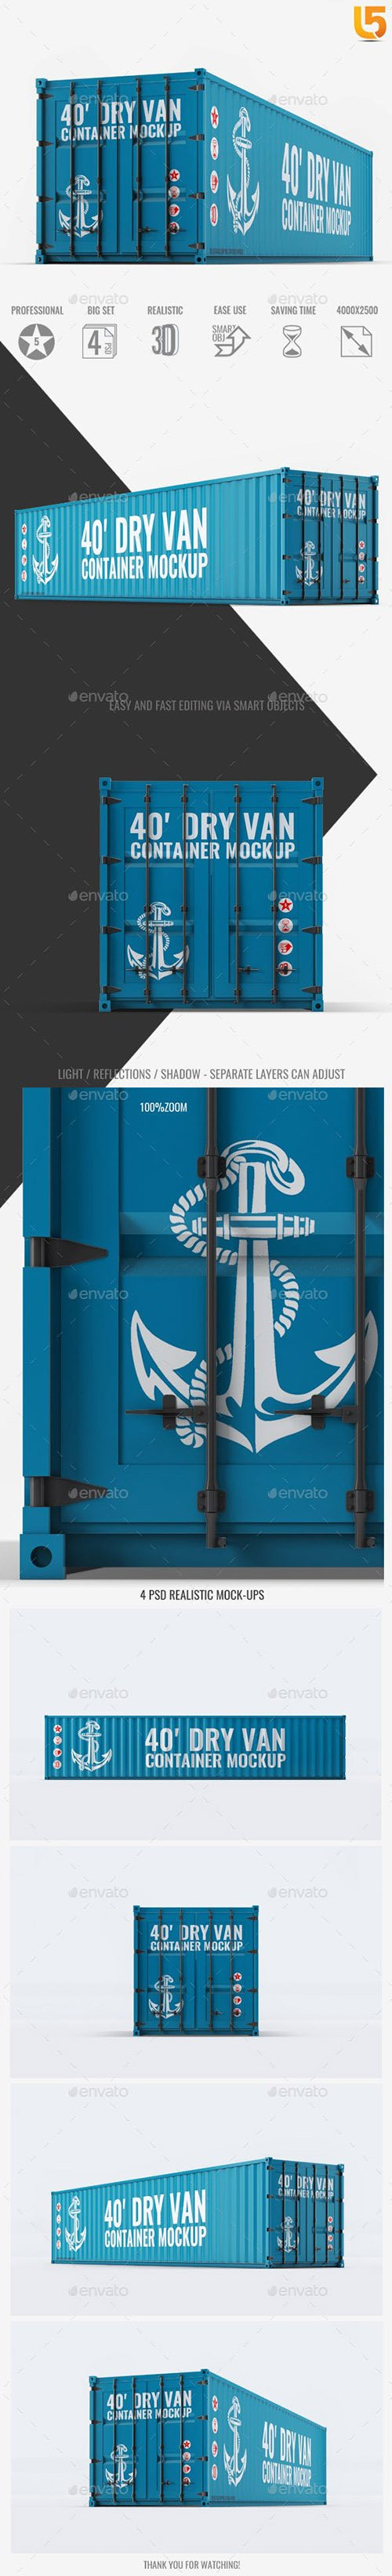 40ft Dry Van Container Mock-up 23224509